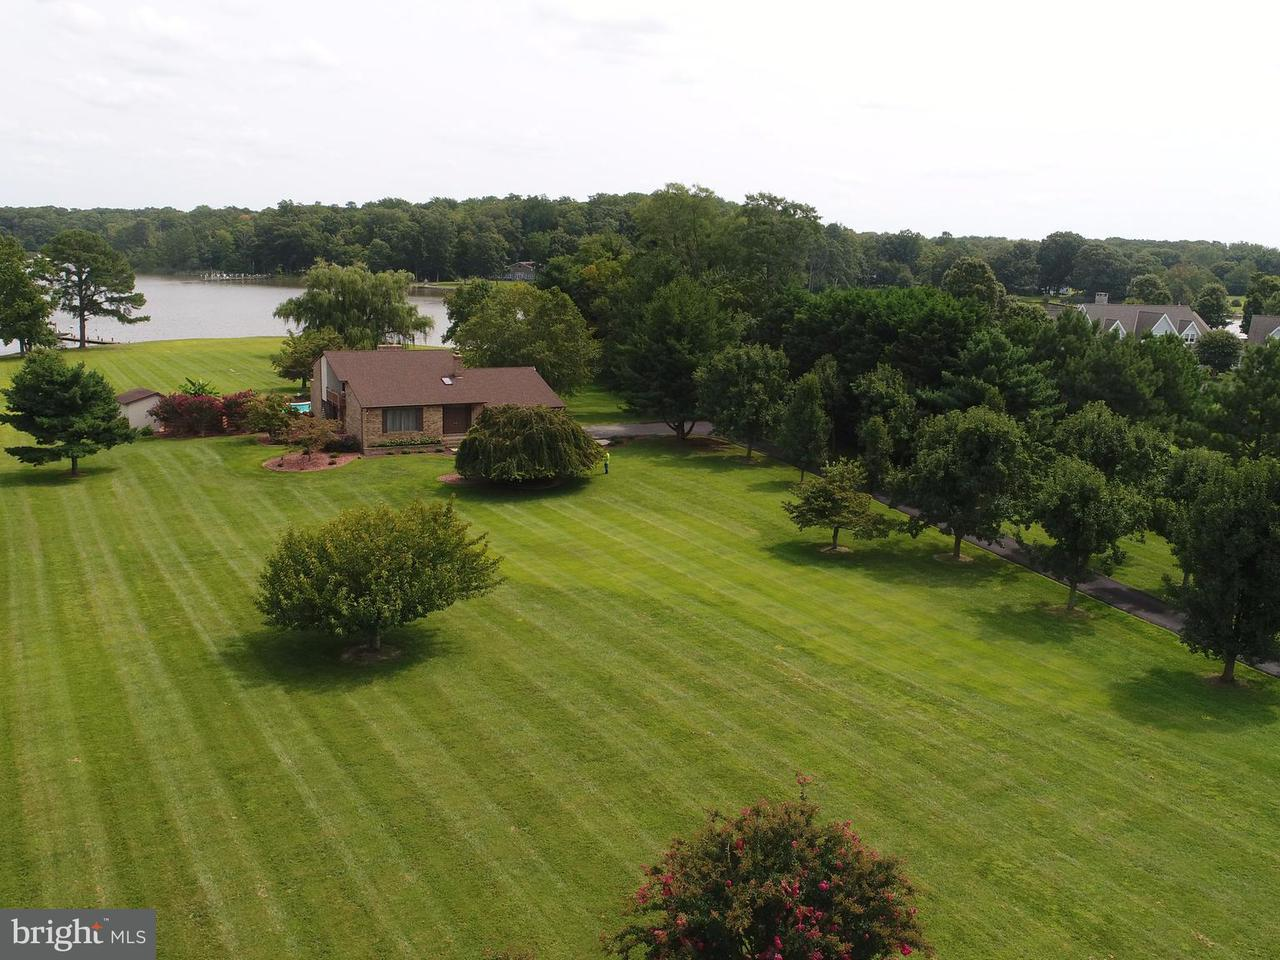 独户住宅 为 销售 在 609 PROSPECT BAY DR E 609 PROSPECT BAY DR E Grasonville, 马里兰州 21638 美国